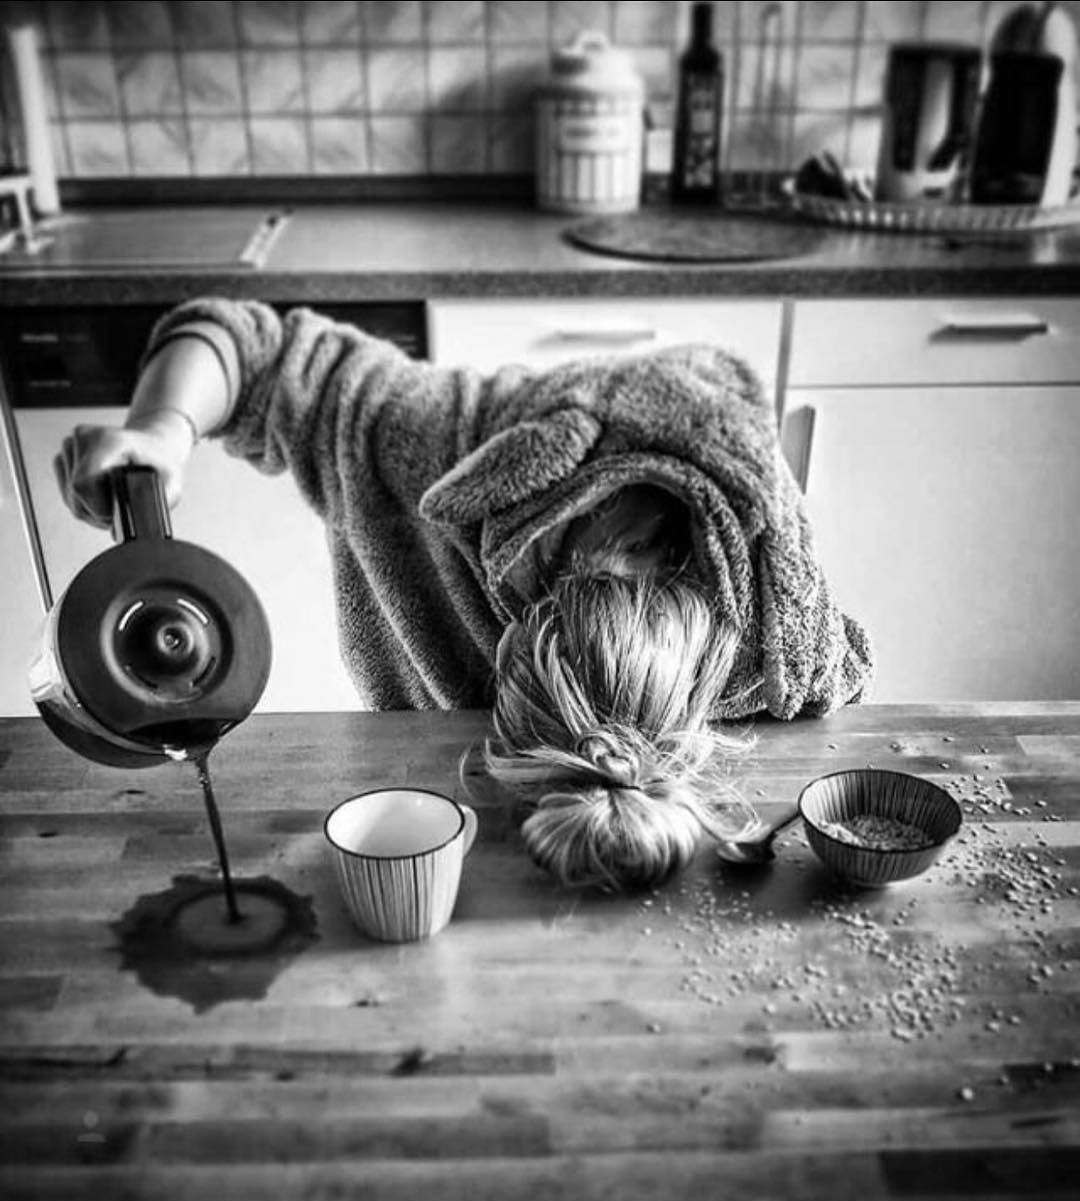 Картинка смешное про утро, картинки про выходной